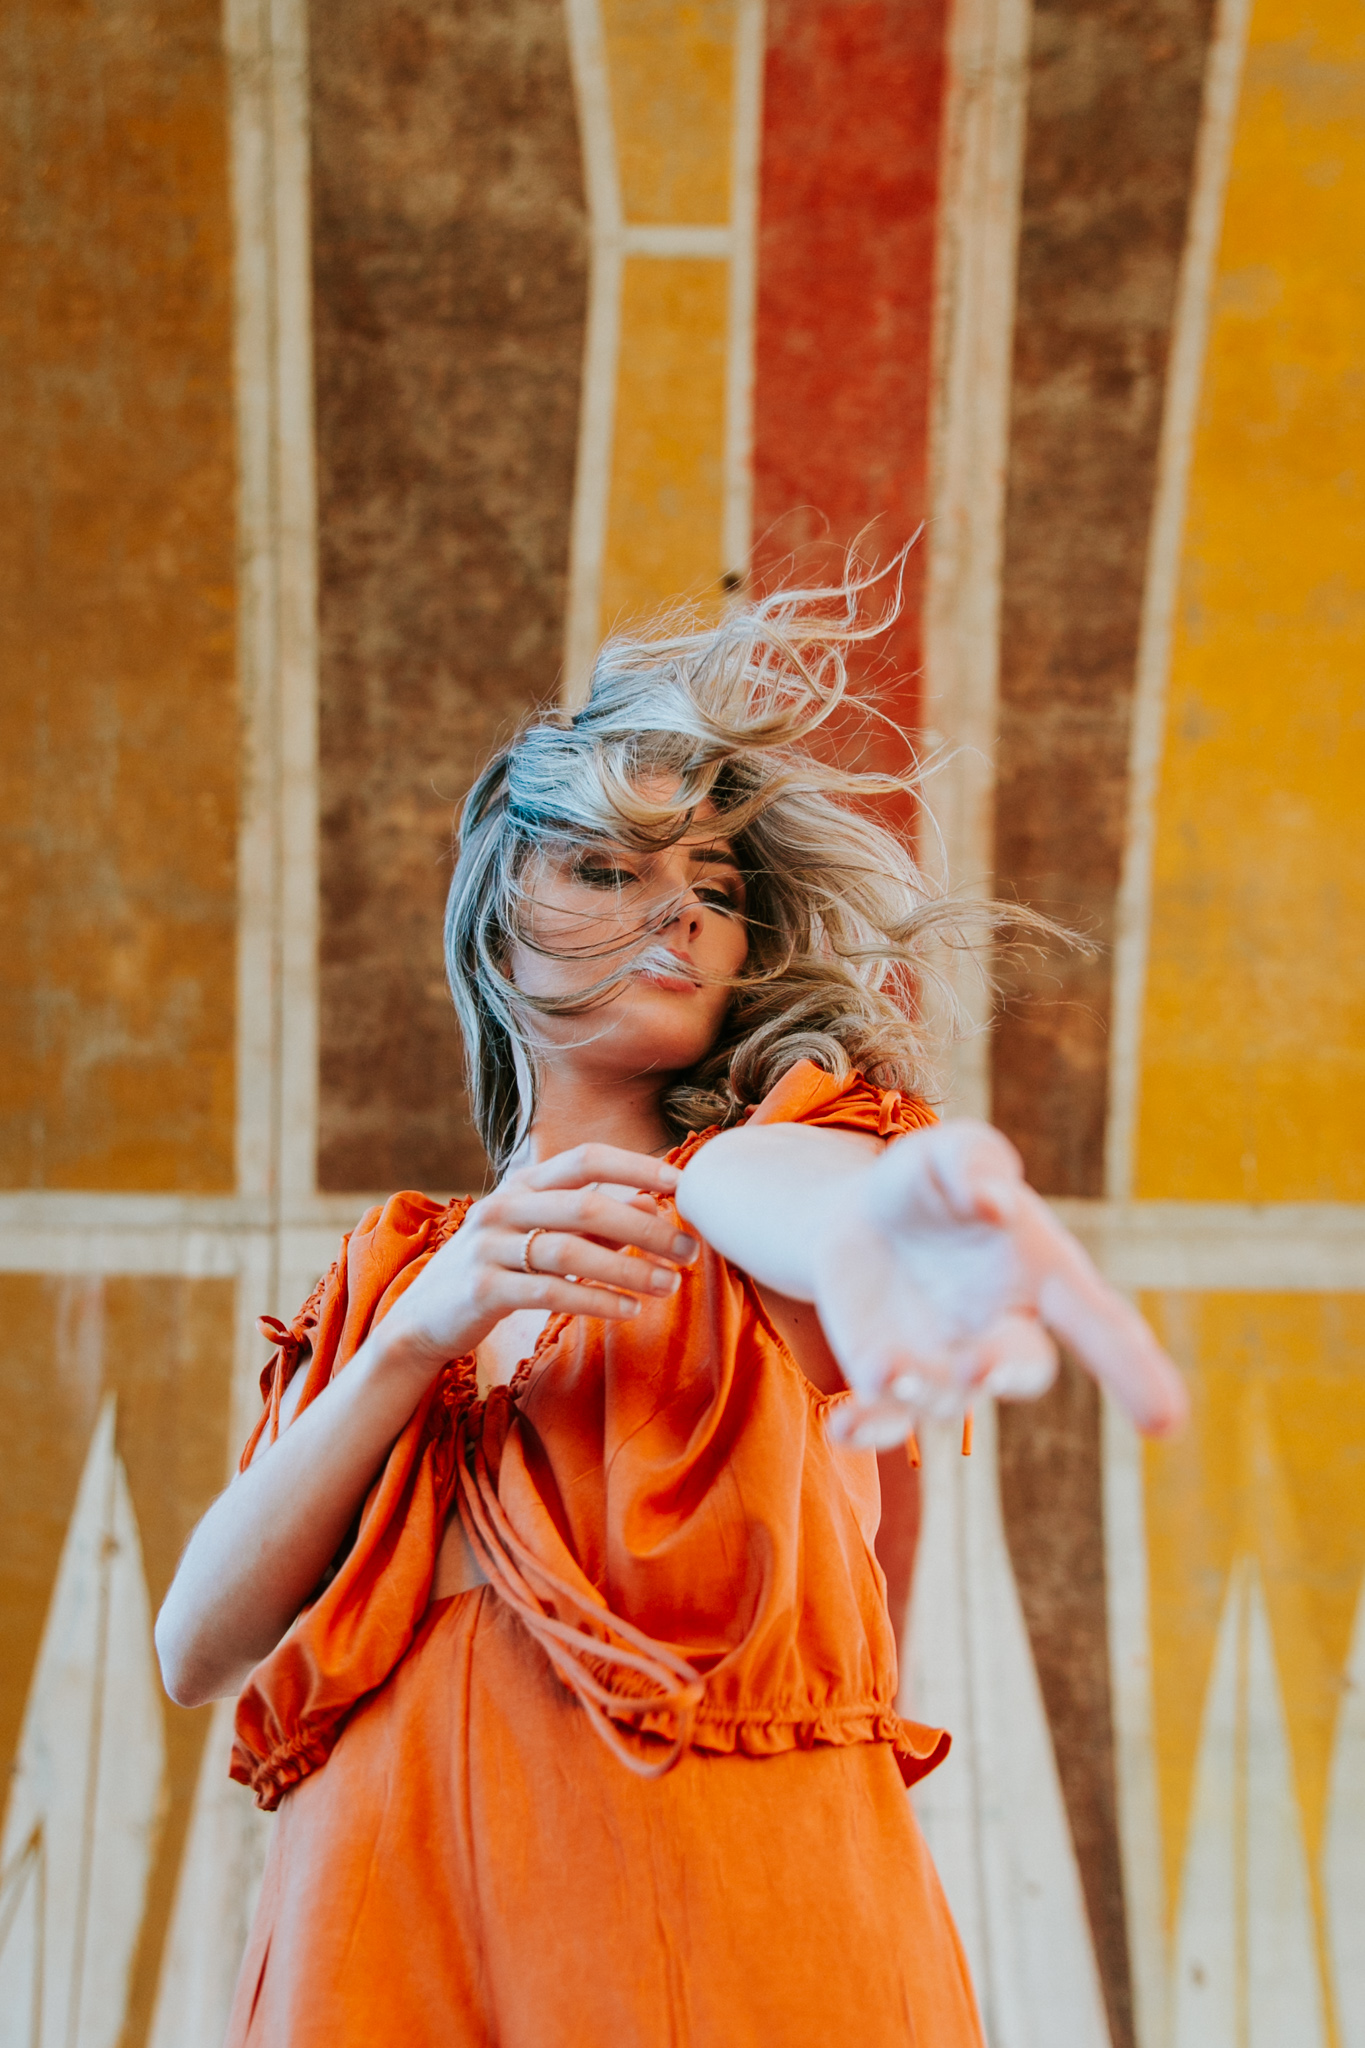 ChelseaScottEvans-Arcosanti-039.jpg